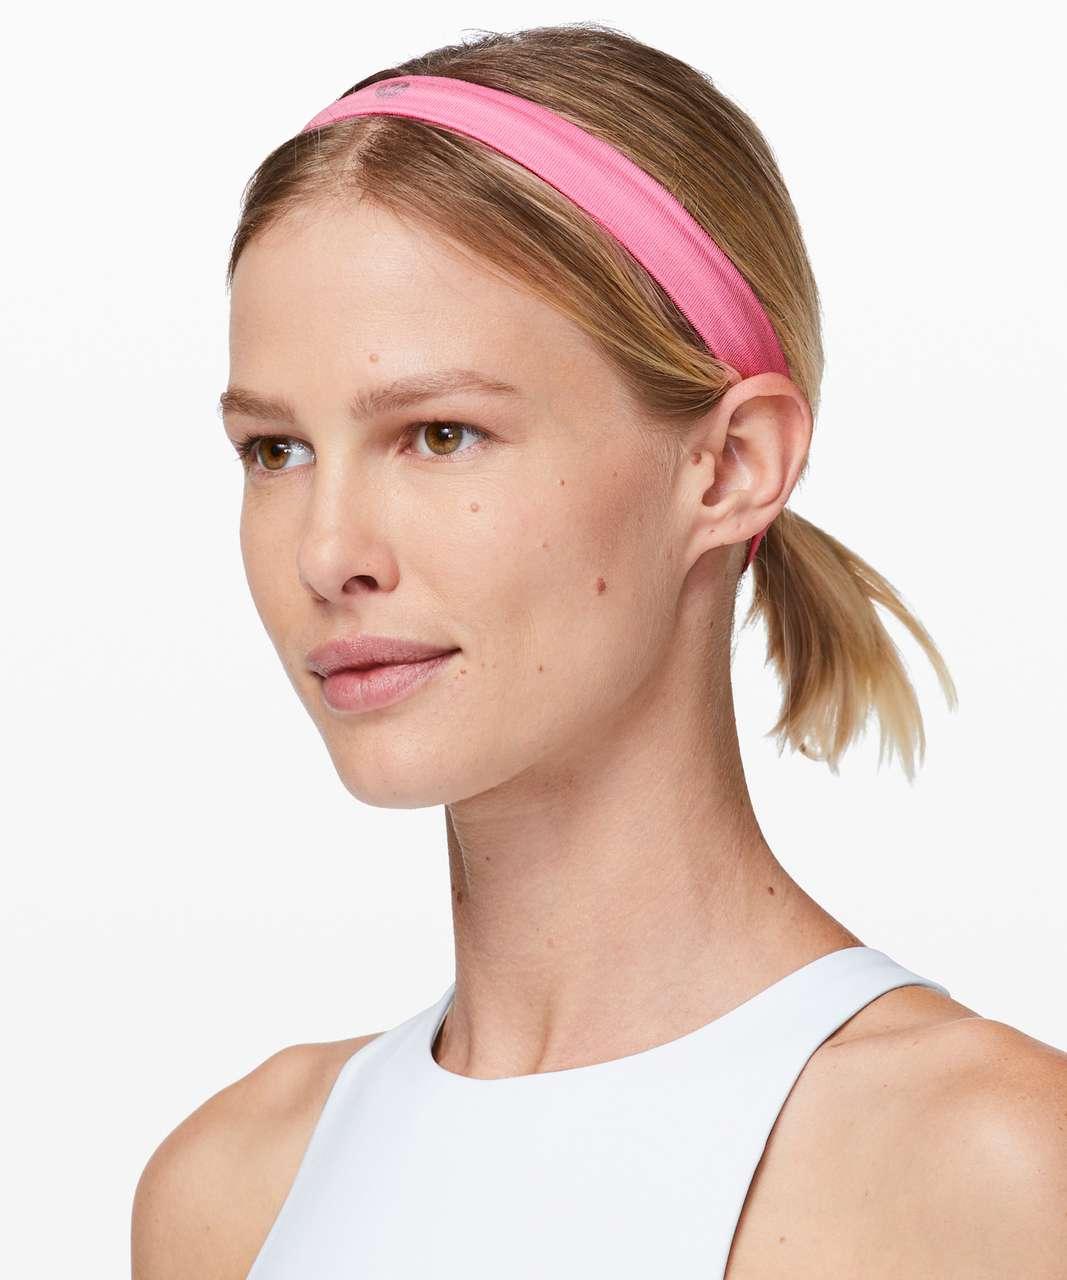 Lululemon Cardio Cross Trainer Headband - Pink Shell / Pink Shell